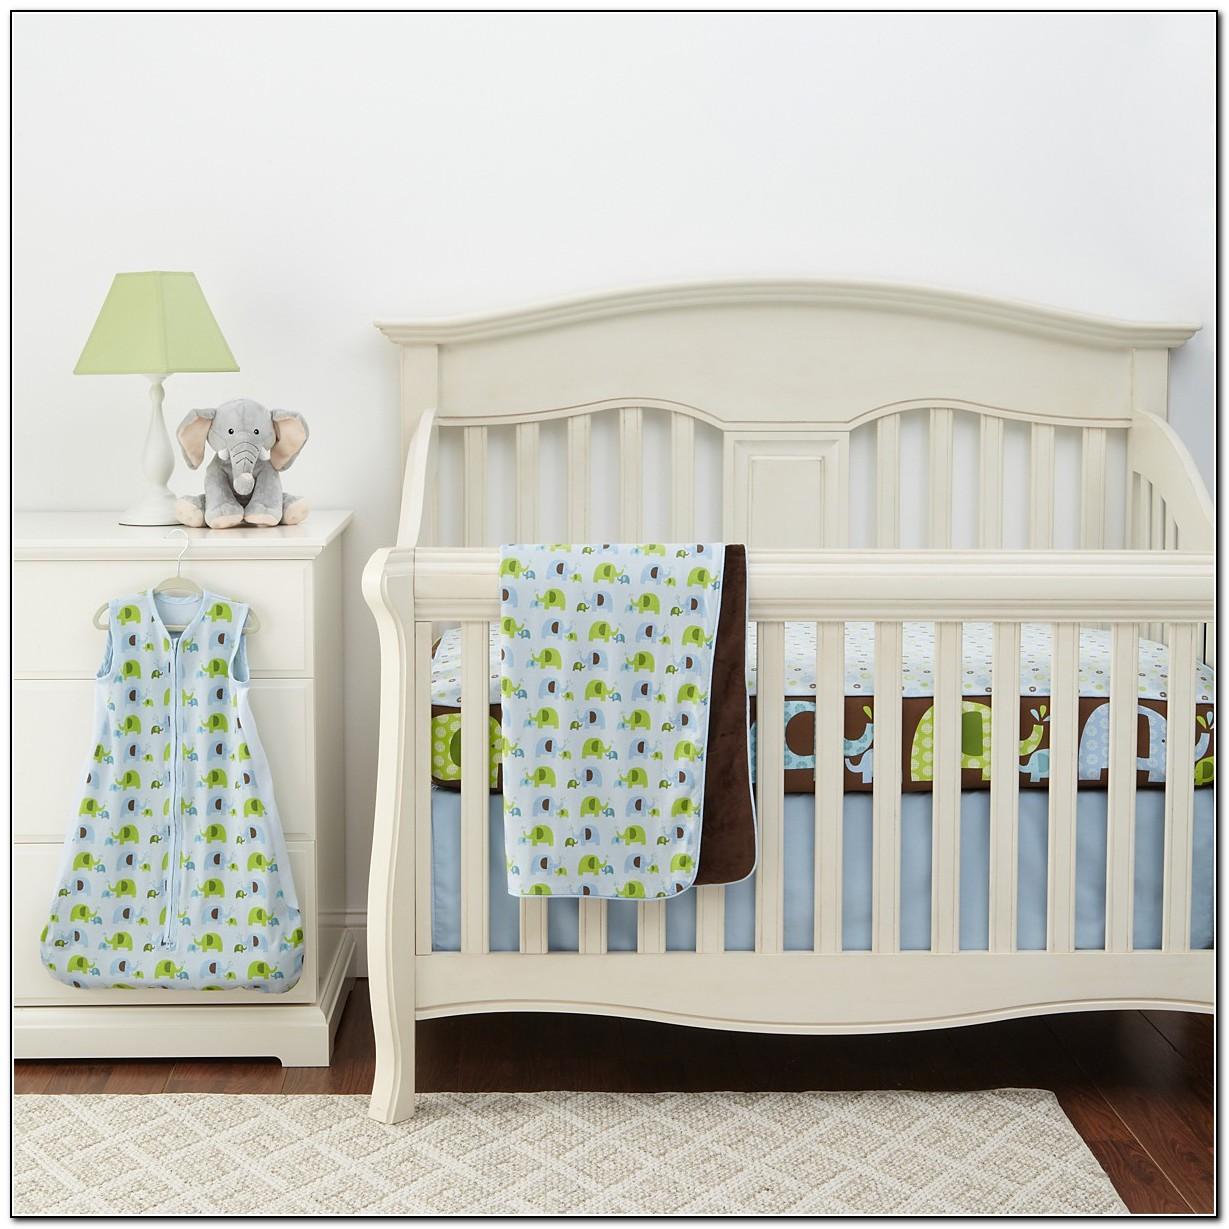 Elephant Baby Bedding Set